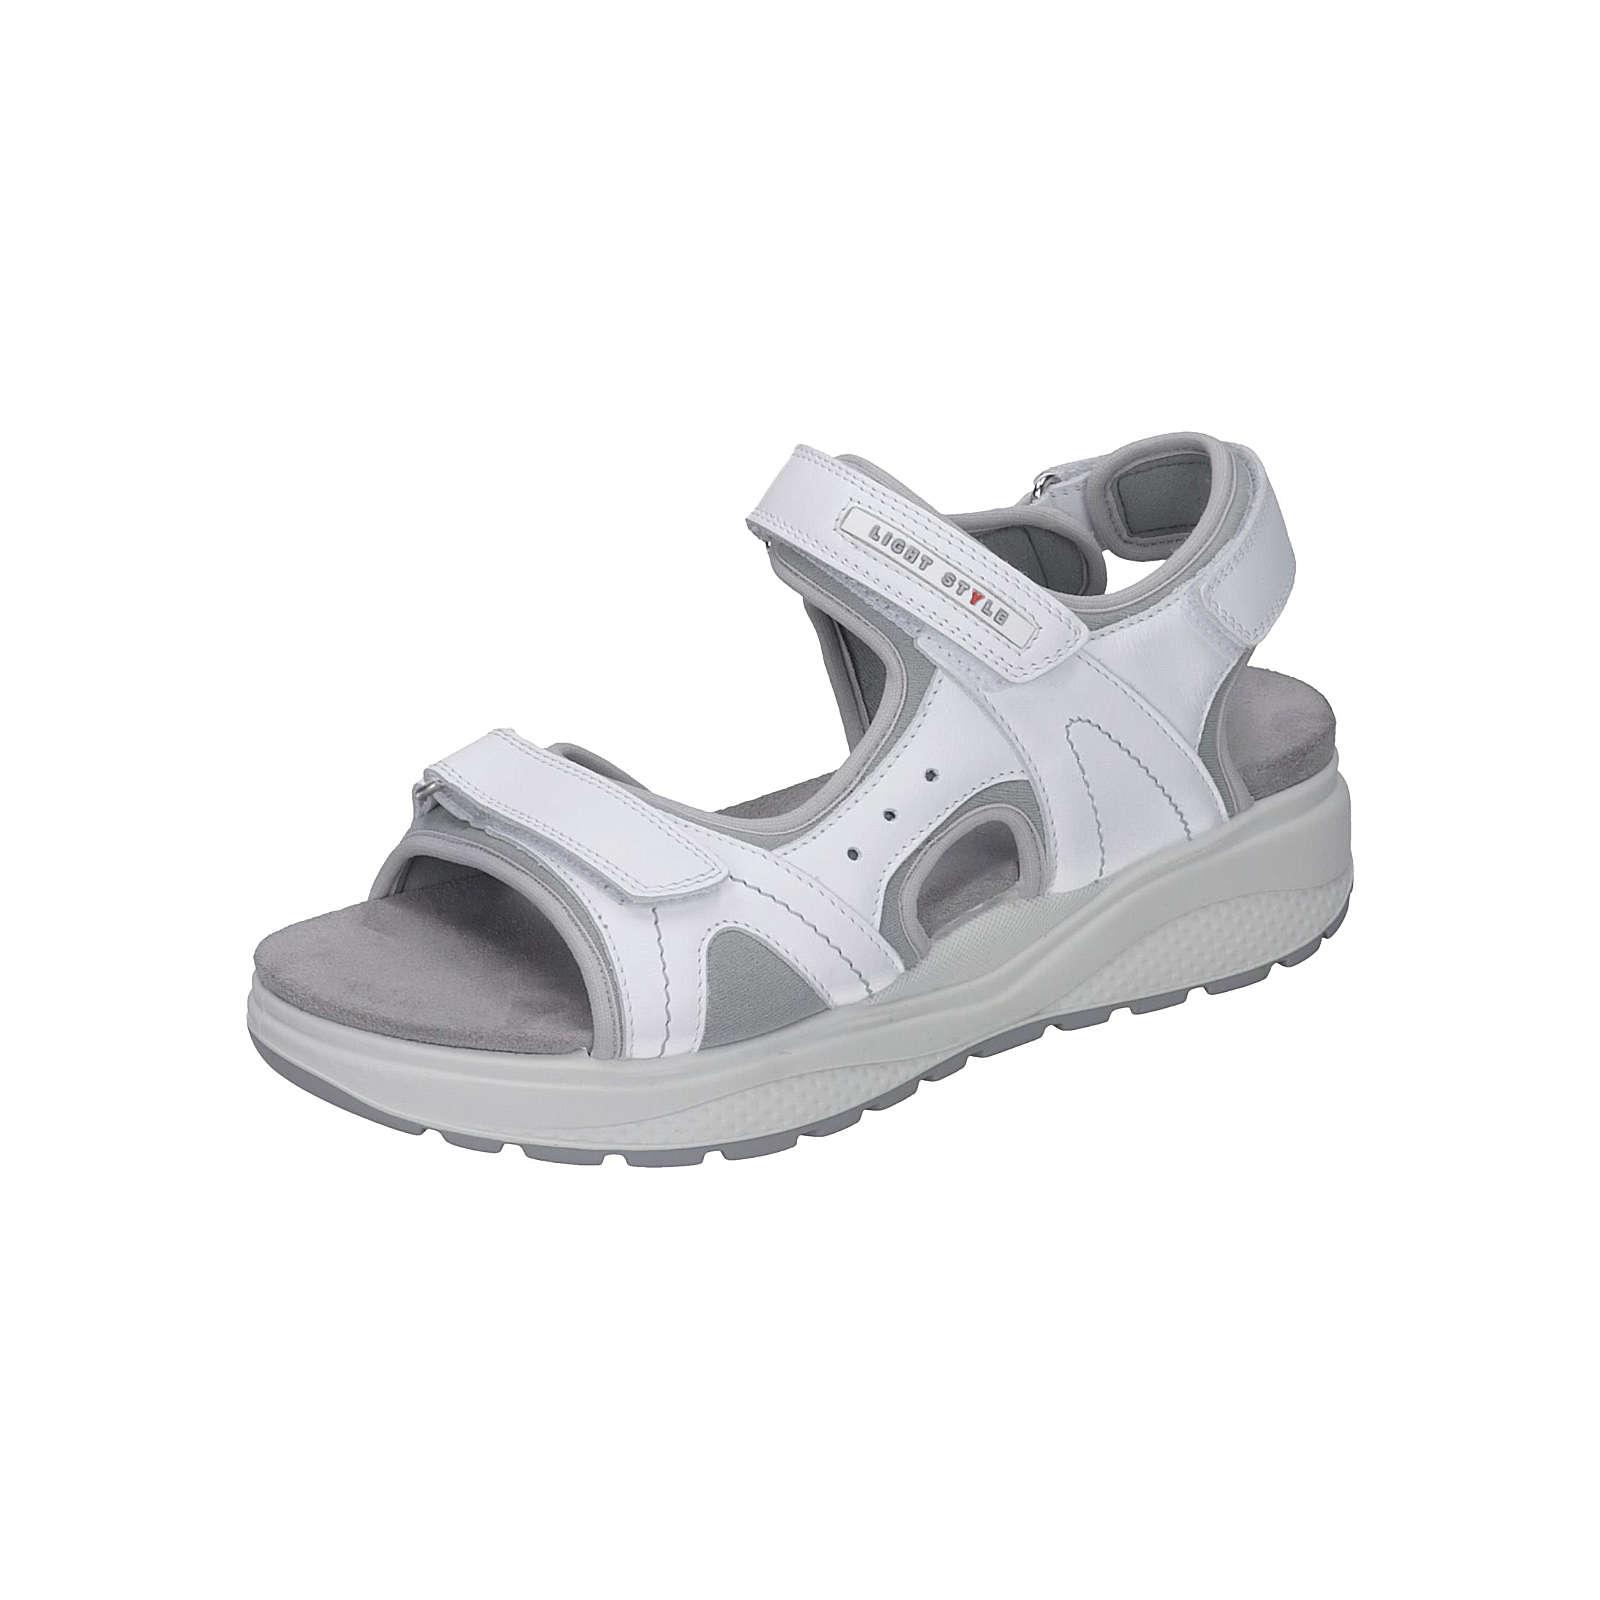 Manitu Manitu-Damen Sandalette Komfort-Sandalen weiß Damen Gr. 38